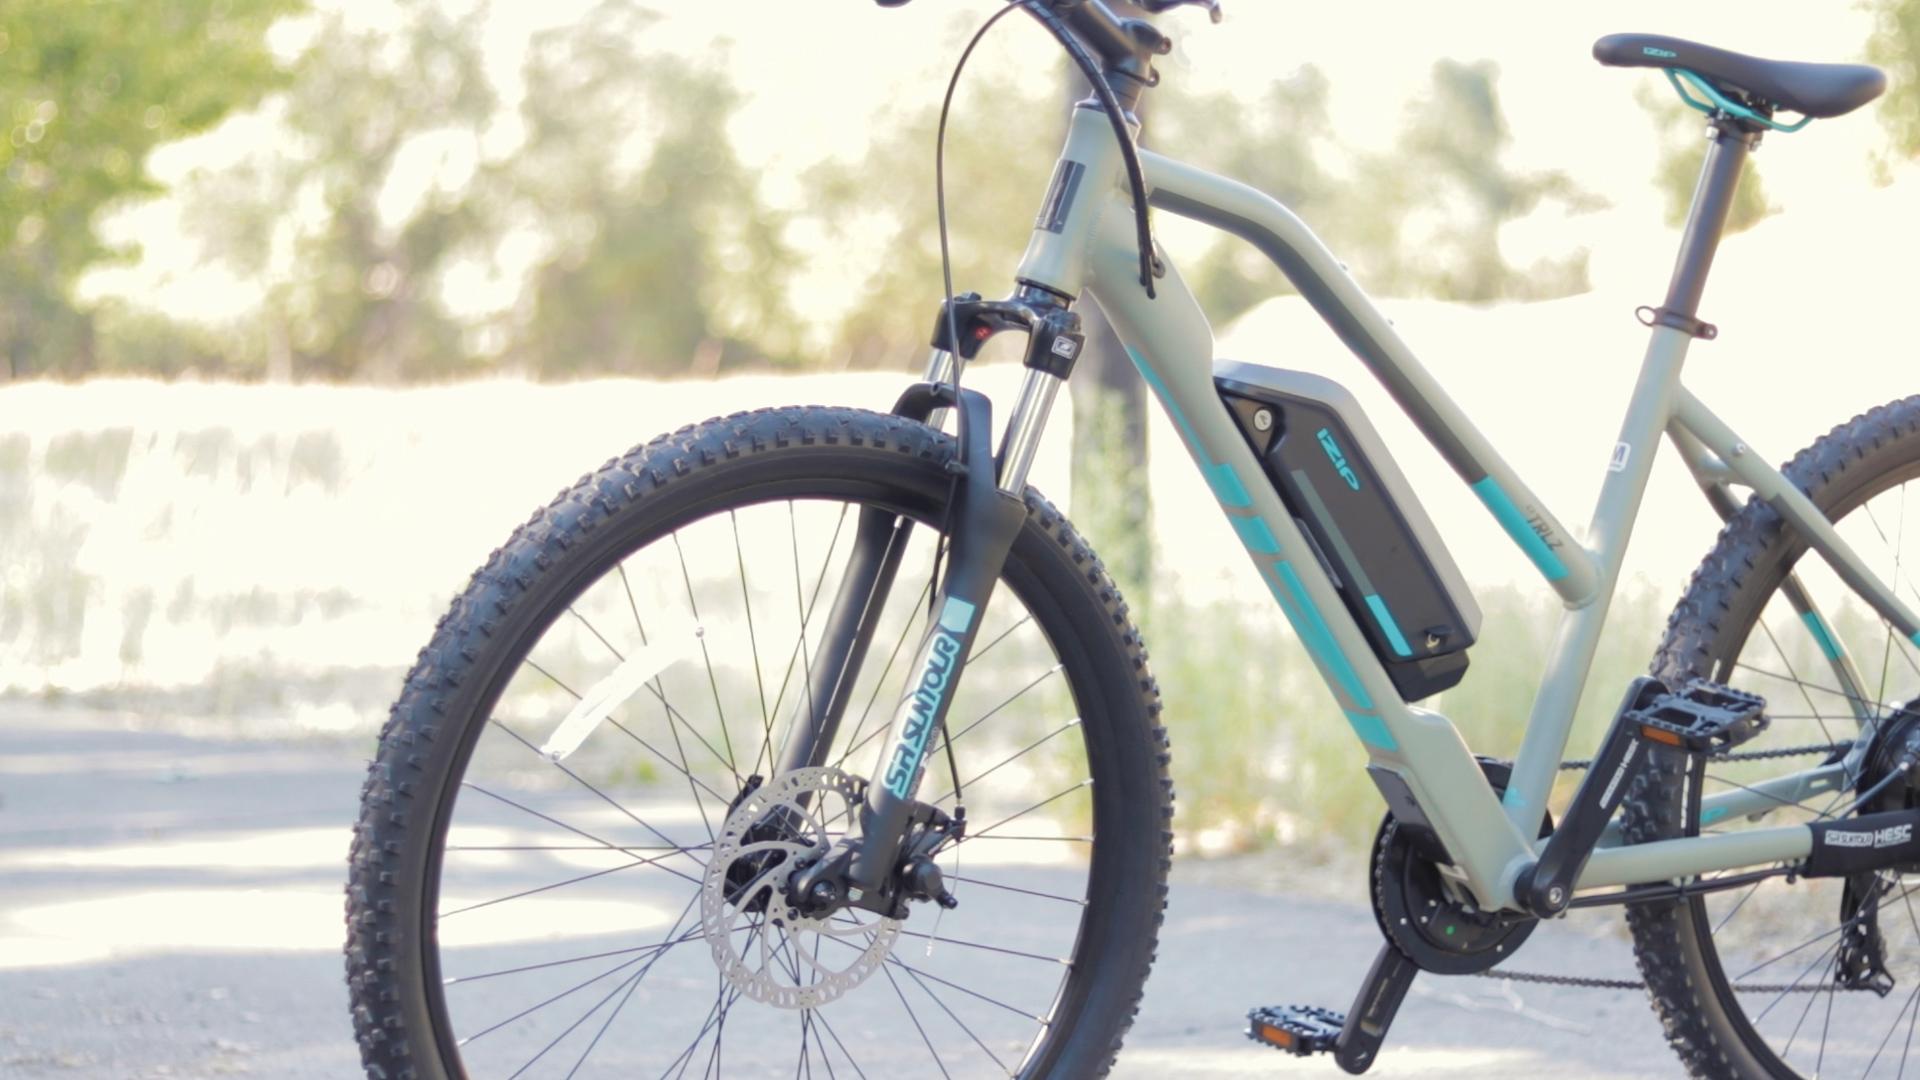 electrified-reviews-izip-trlz-electric-bike-review-suntour-xce-suspension-2.jpg